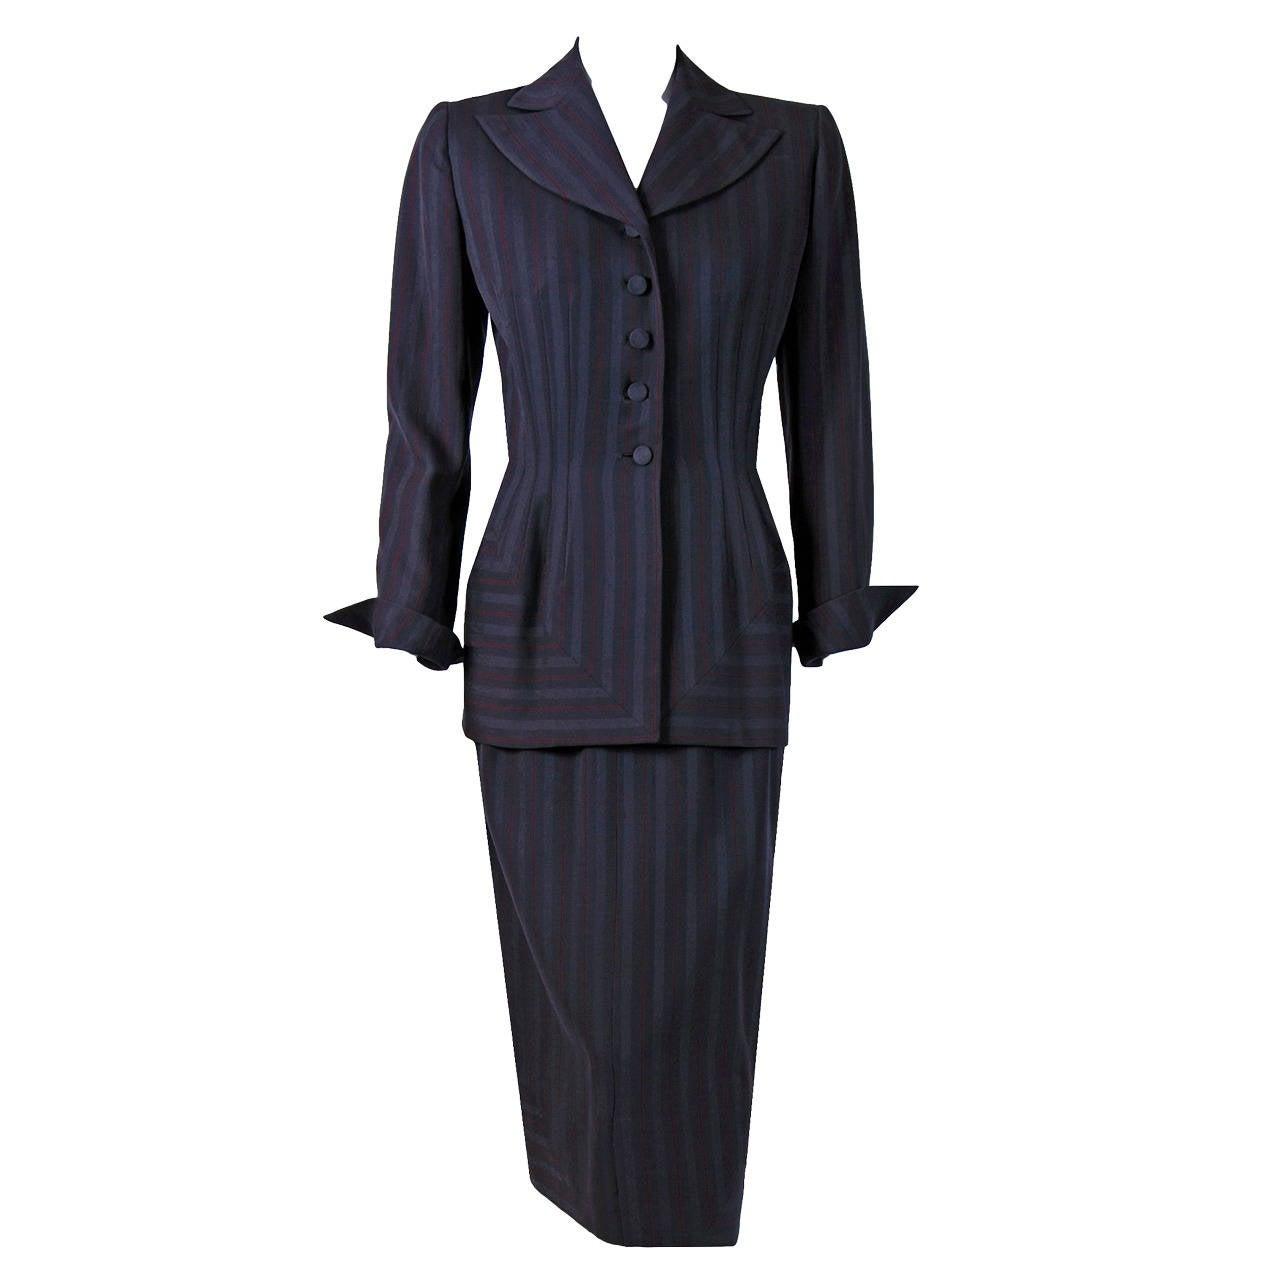 1940's Irene Grey Pinstripe Wool-Gabardine Deco Hourglass Jacket & Skirt Suit For Sale